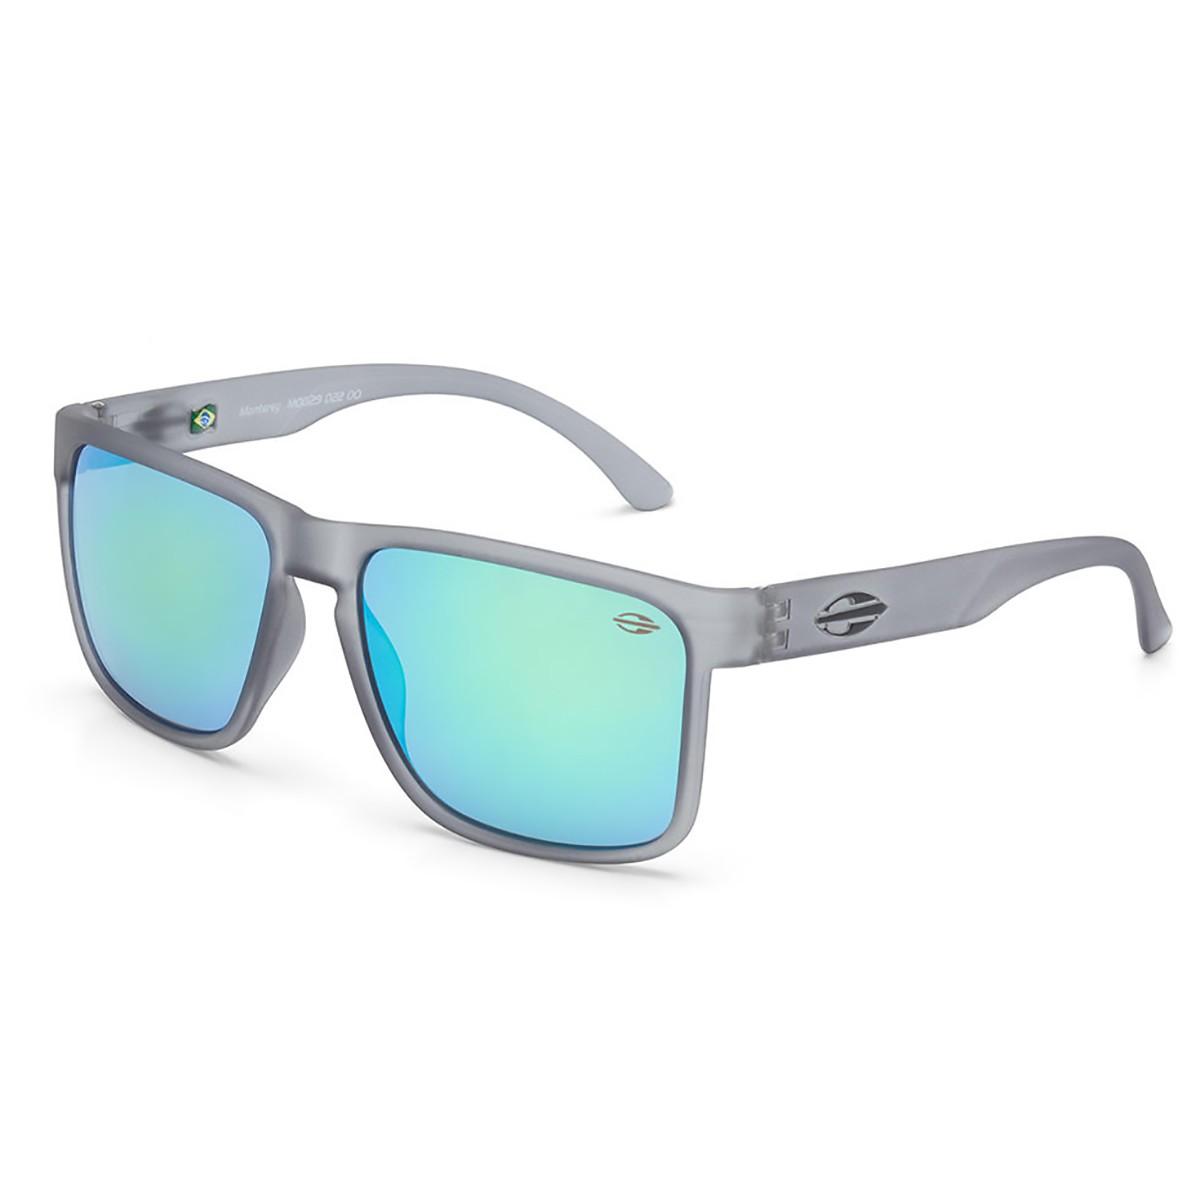 845b7d257 Compre Óculos de Sol Mormaii Monterey em 10X | Tri-Jóia Shop